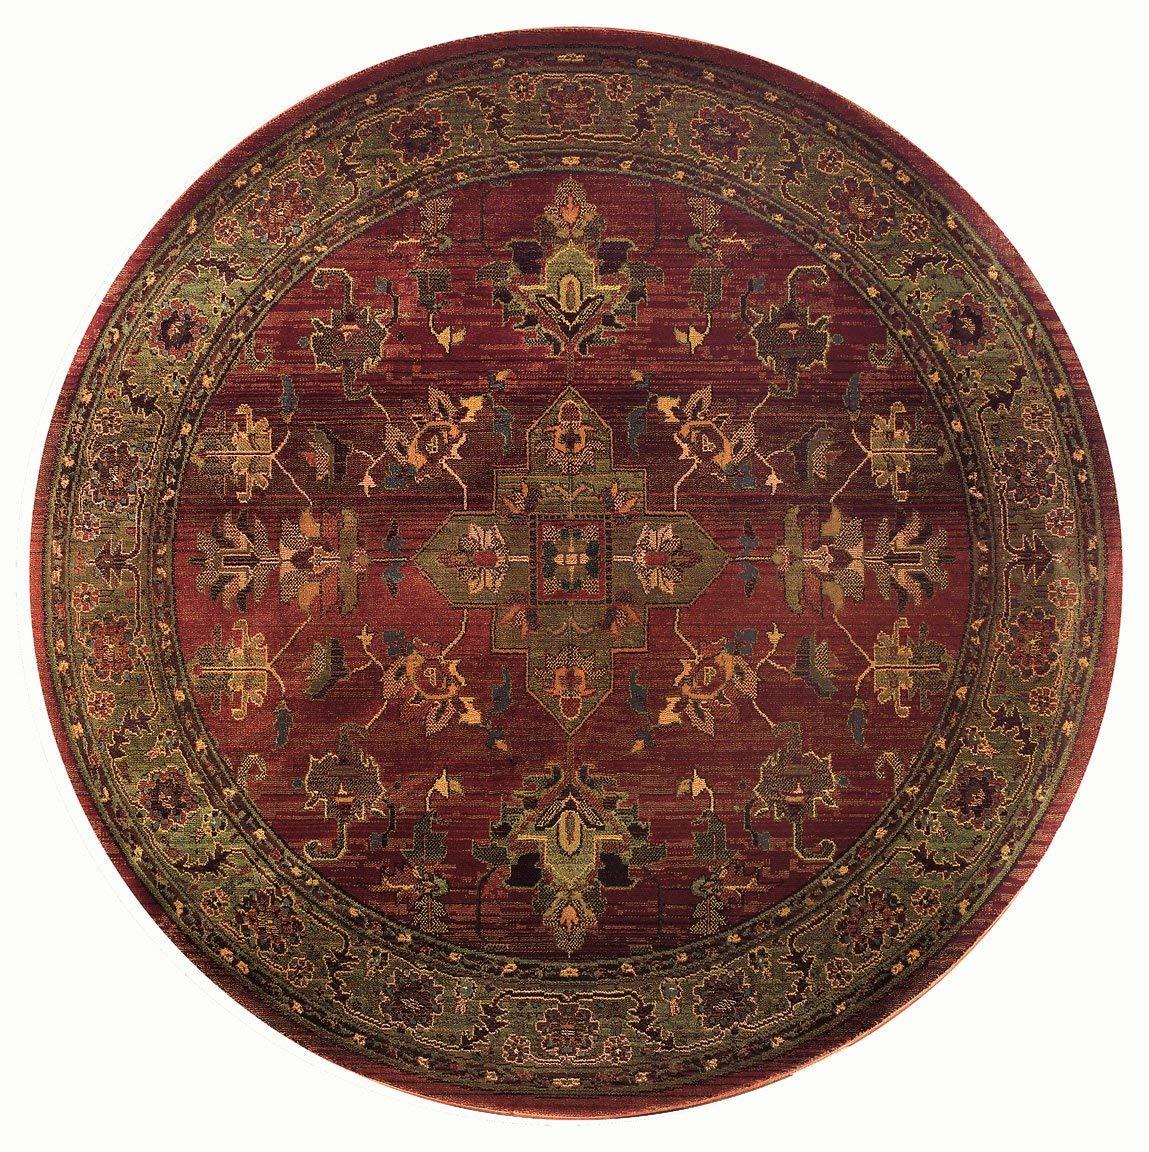 Carpet clipart area rug. Amazon com kharma c